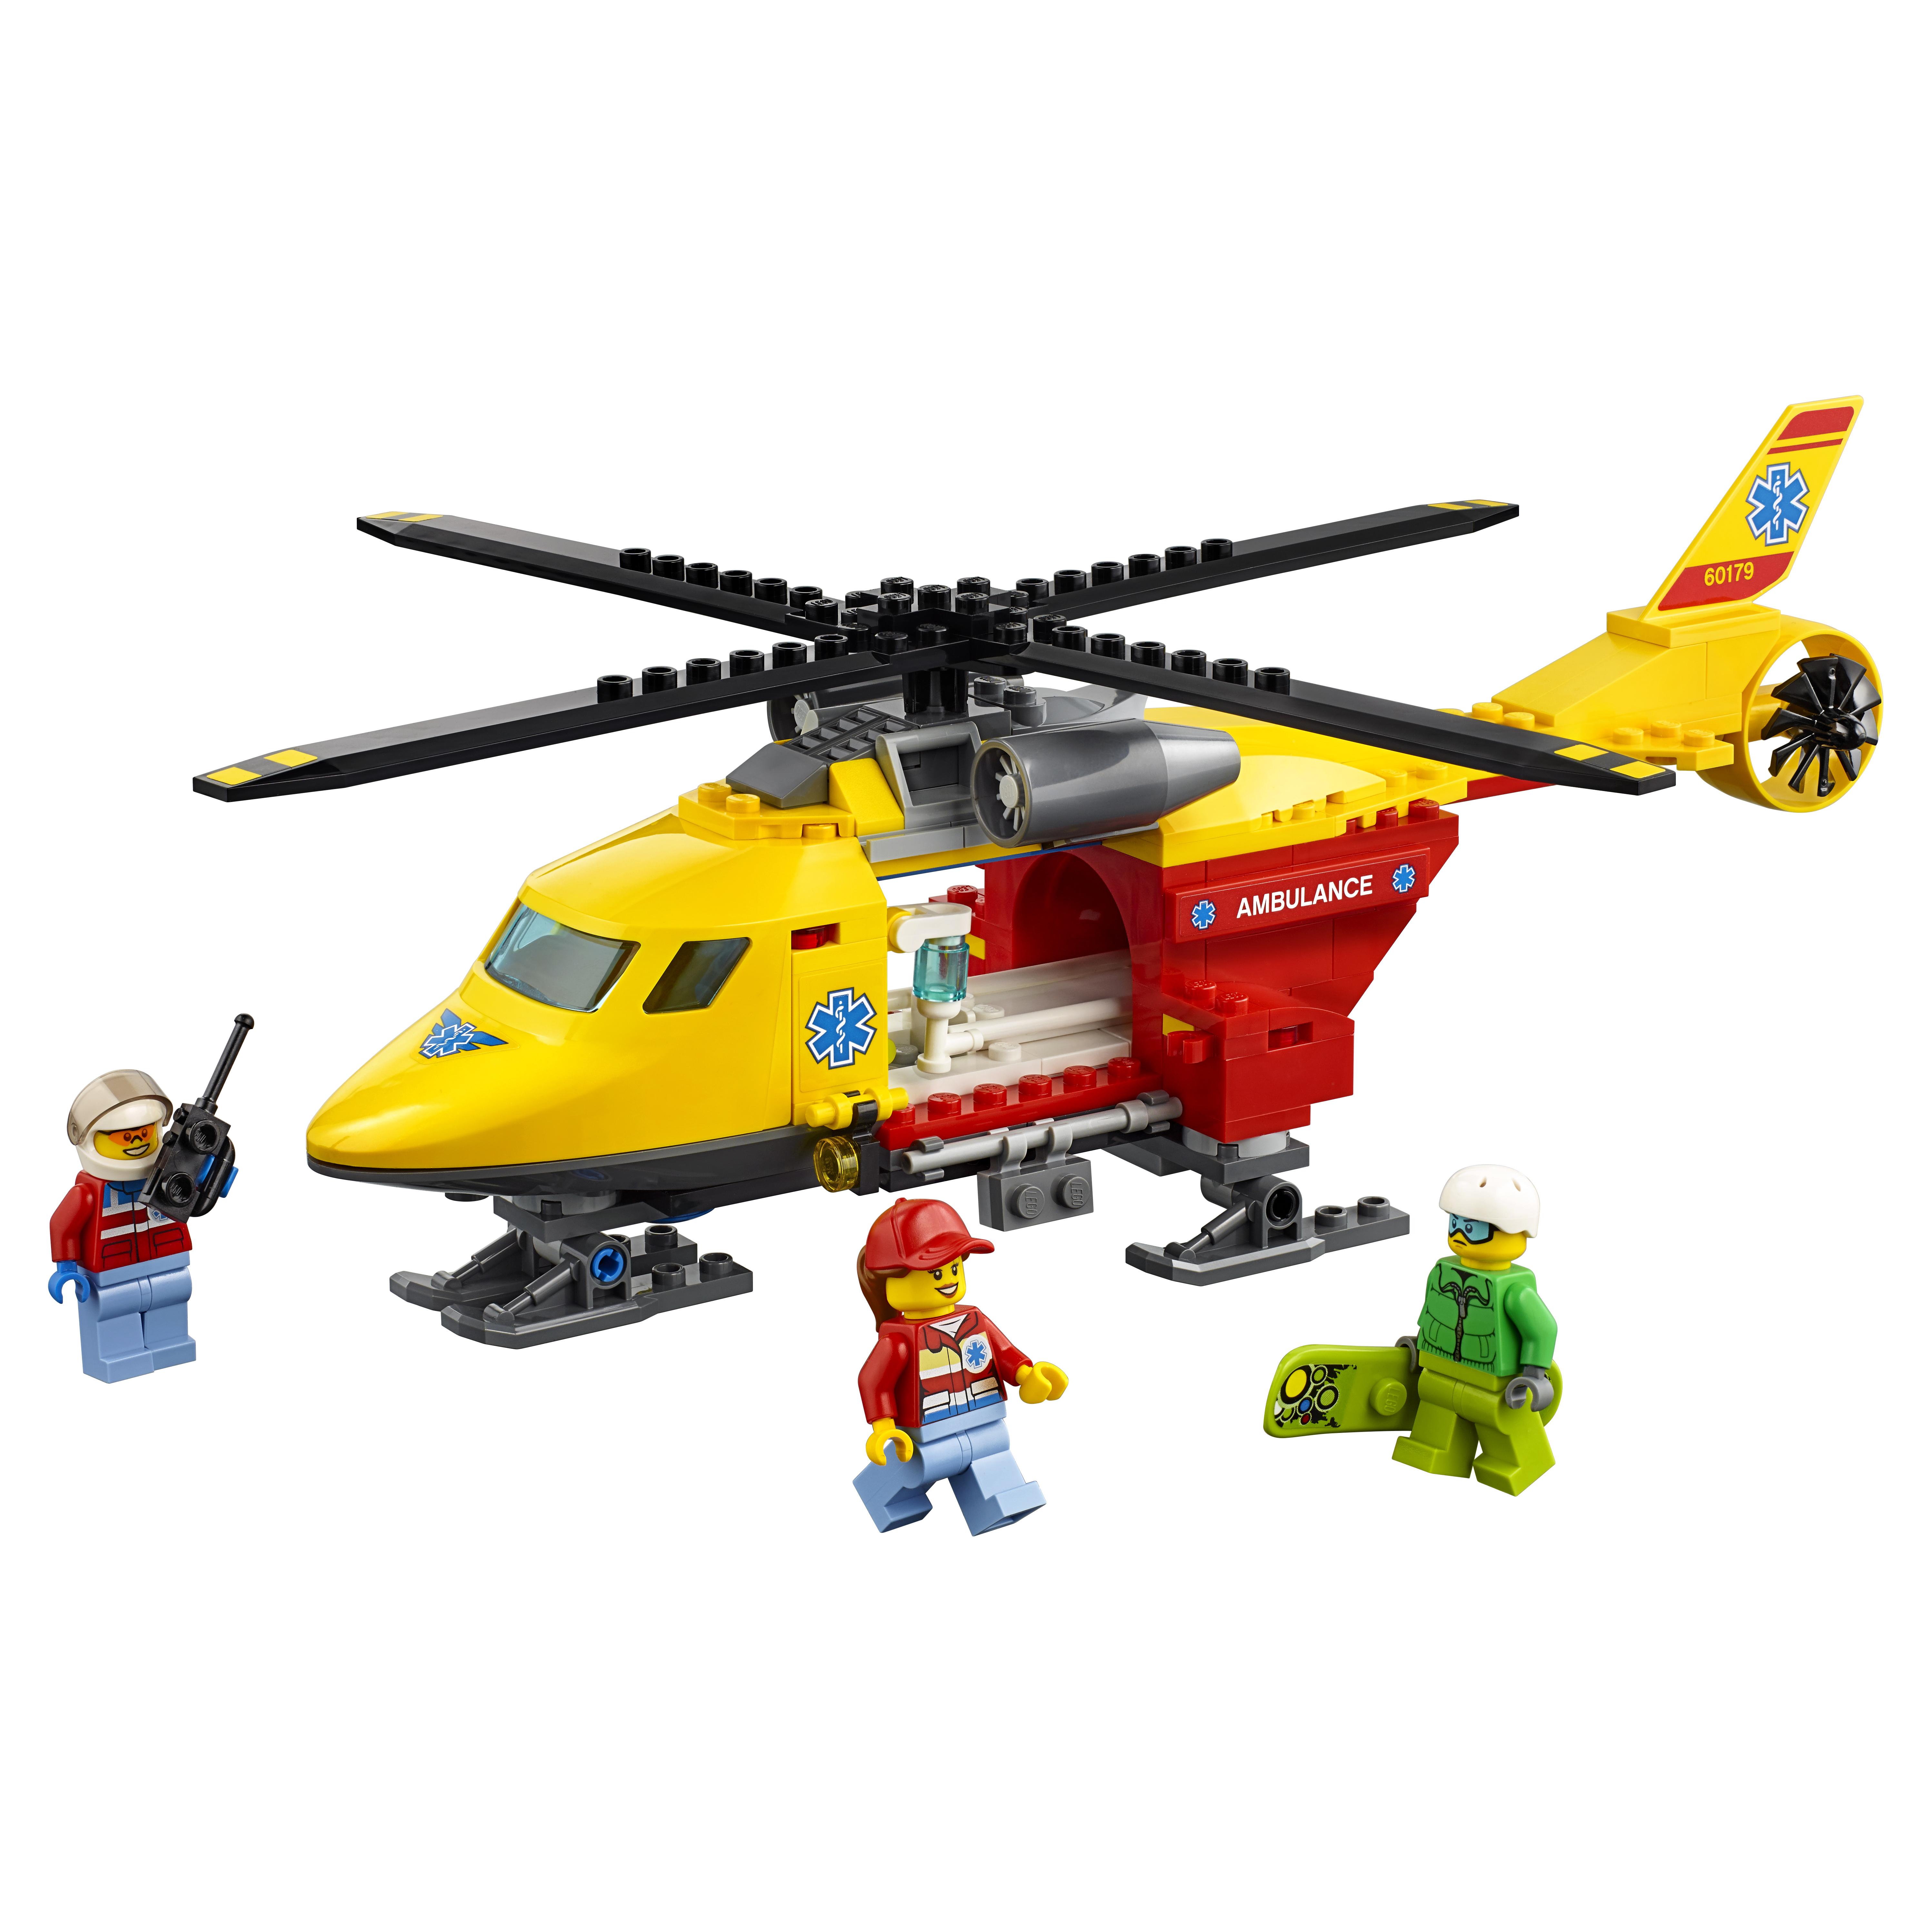 Конструктор LEGO City Great Vehicles Вертолёт скорой помощи (60179) фото